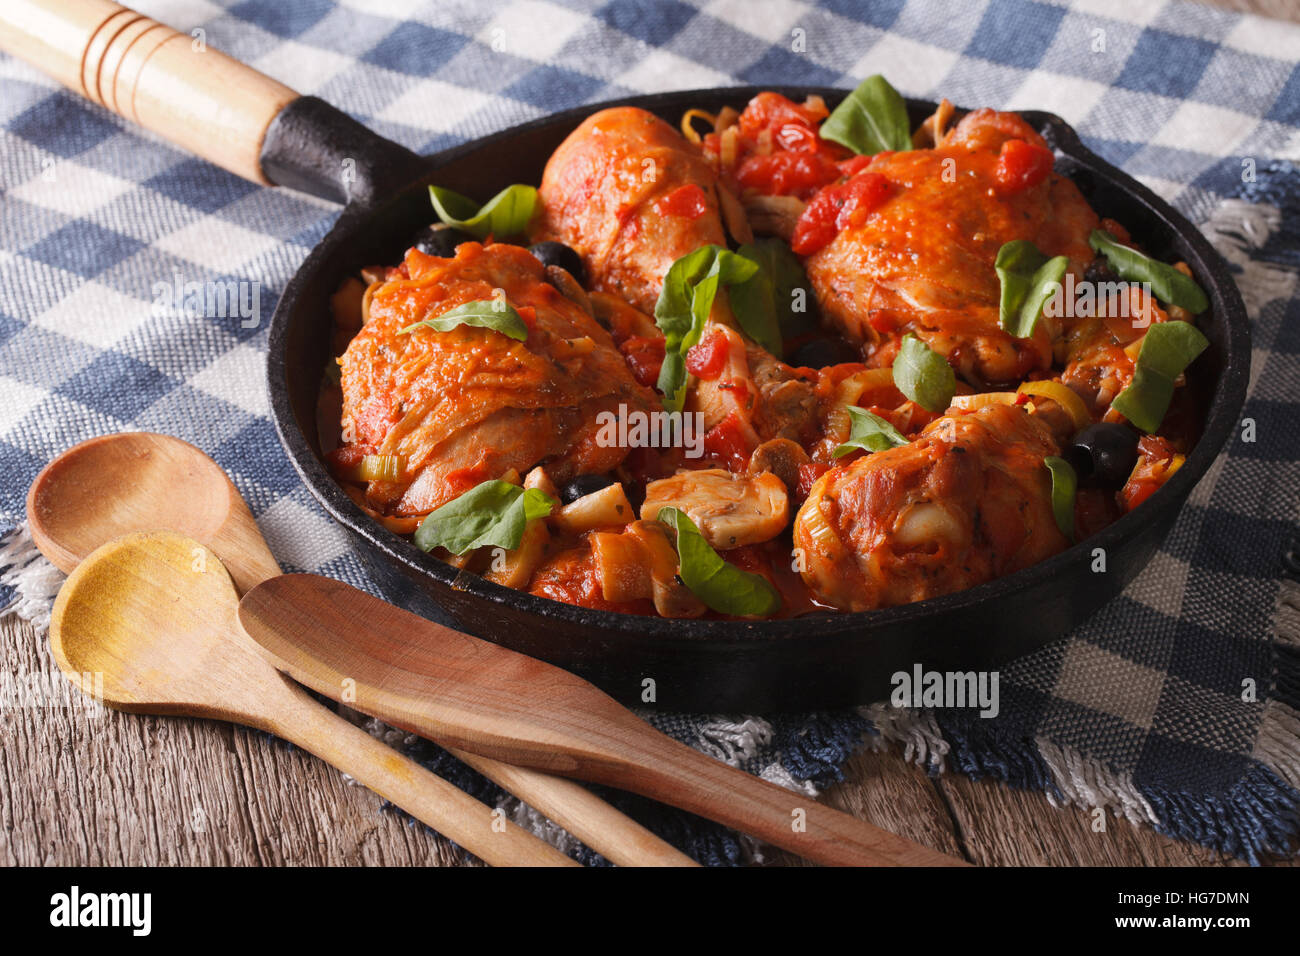 Italienische Küche: Huhn Cacciatori mit Pilzen hautnah in einer Pfanne erhitzen. Horizontale Stockbild